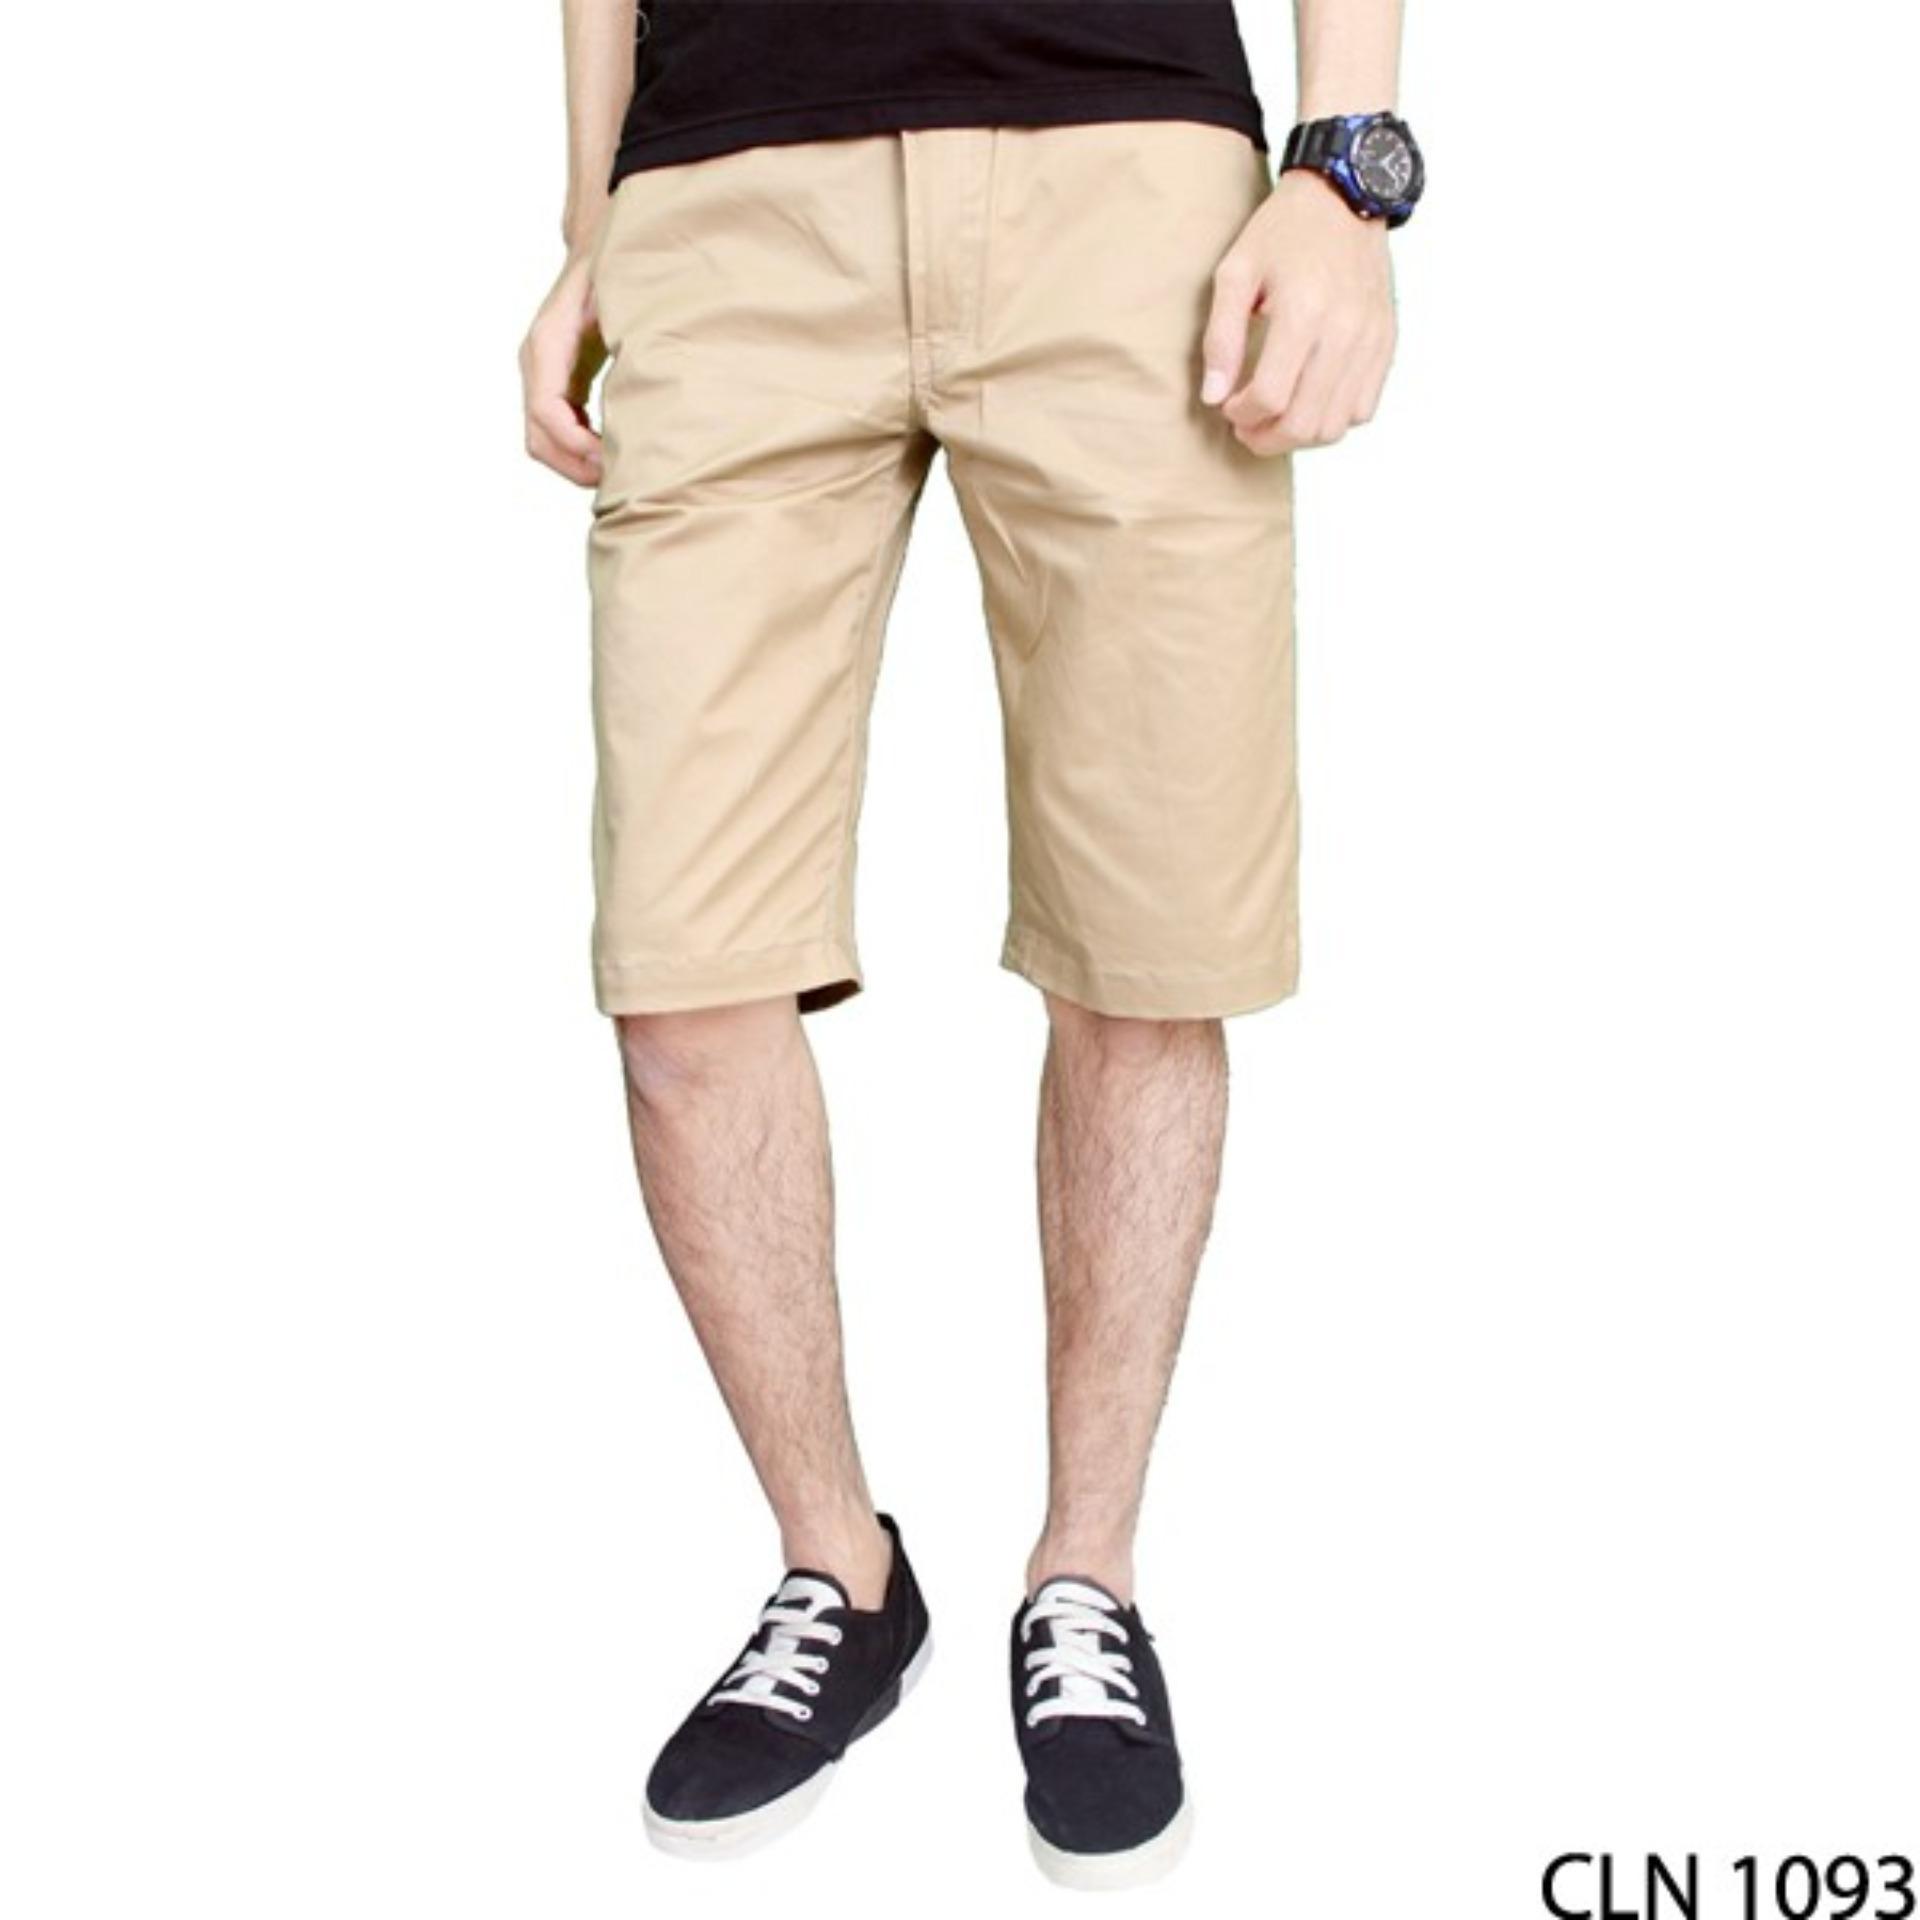 Gudang Fashion - Celana Pendek Chino Pria - Cream